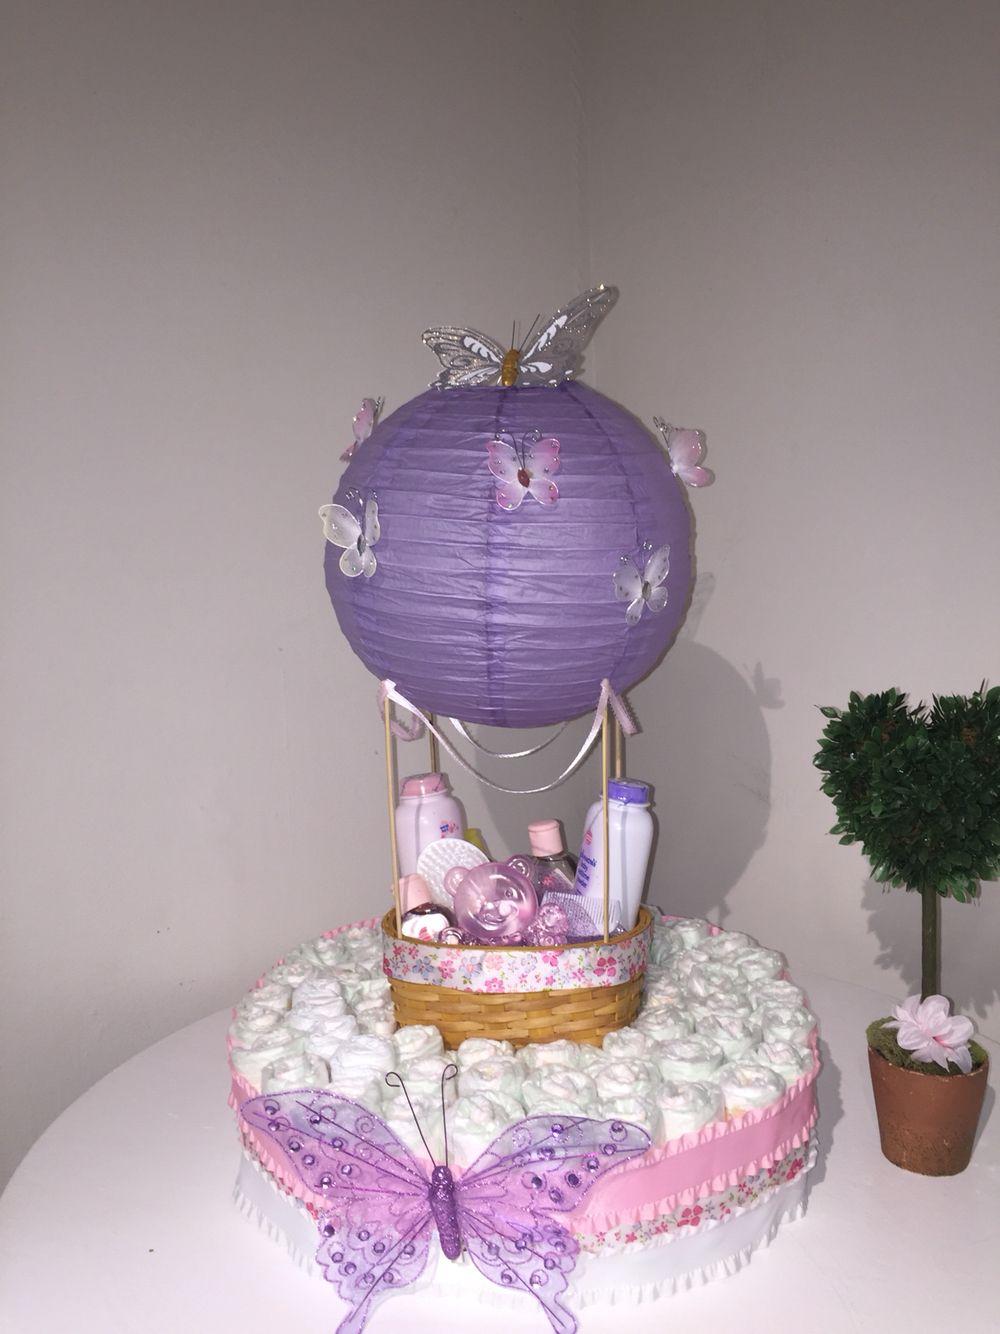 hot air balloon diaper cake mc creations pinterest hot air balloons air balloon and diapers. Black Bedroom Furniture Sets. Home Design Ideas